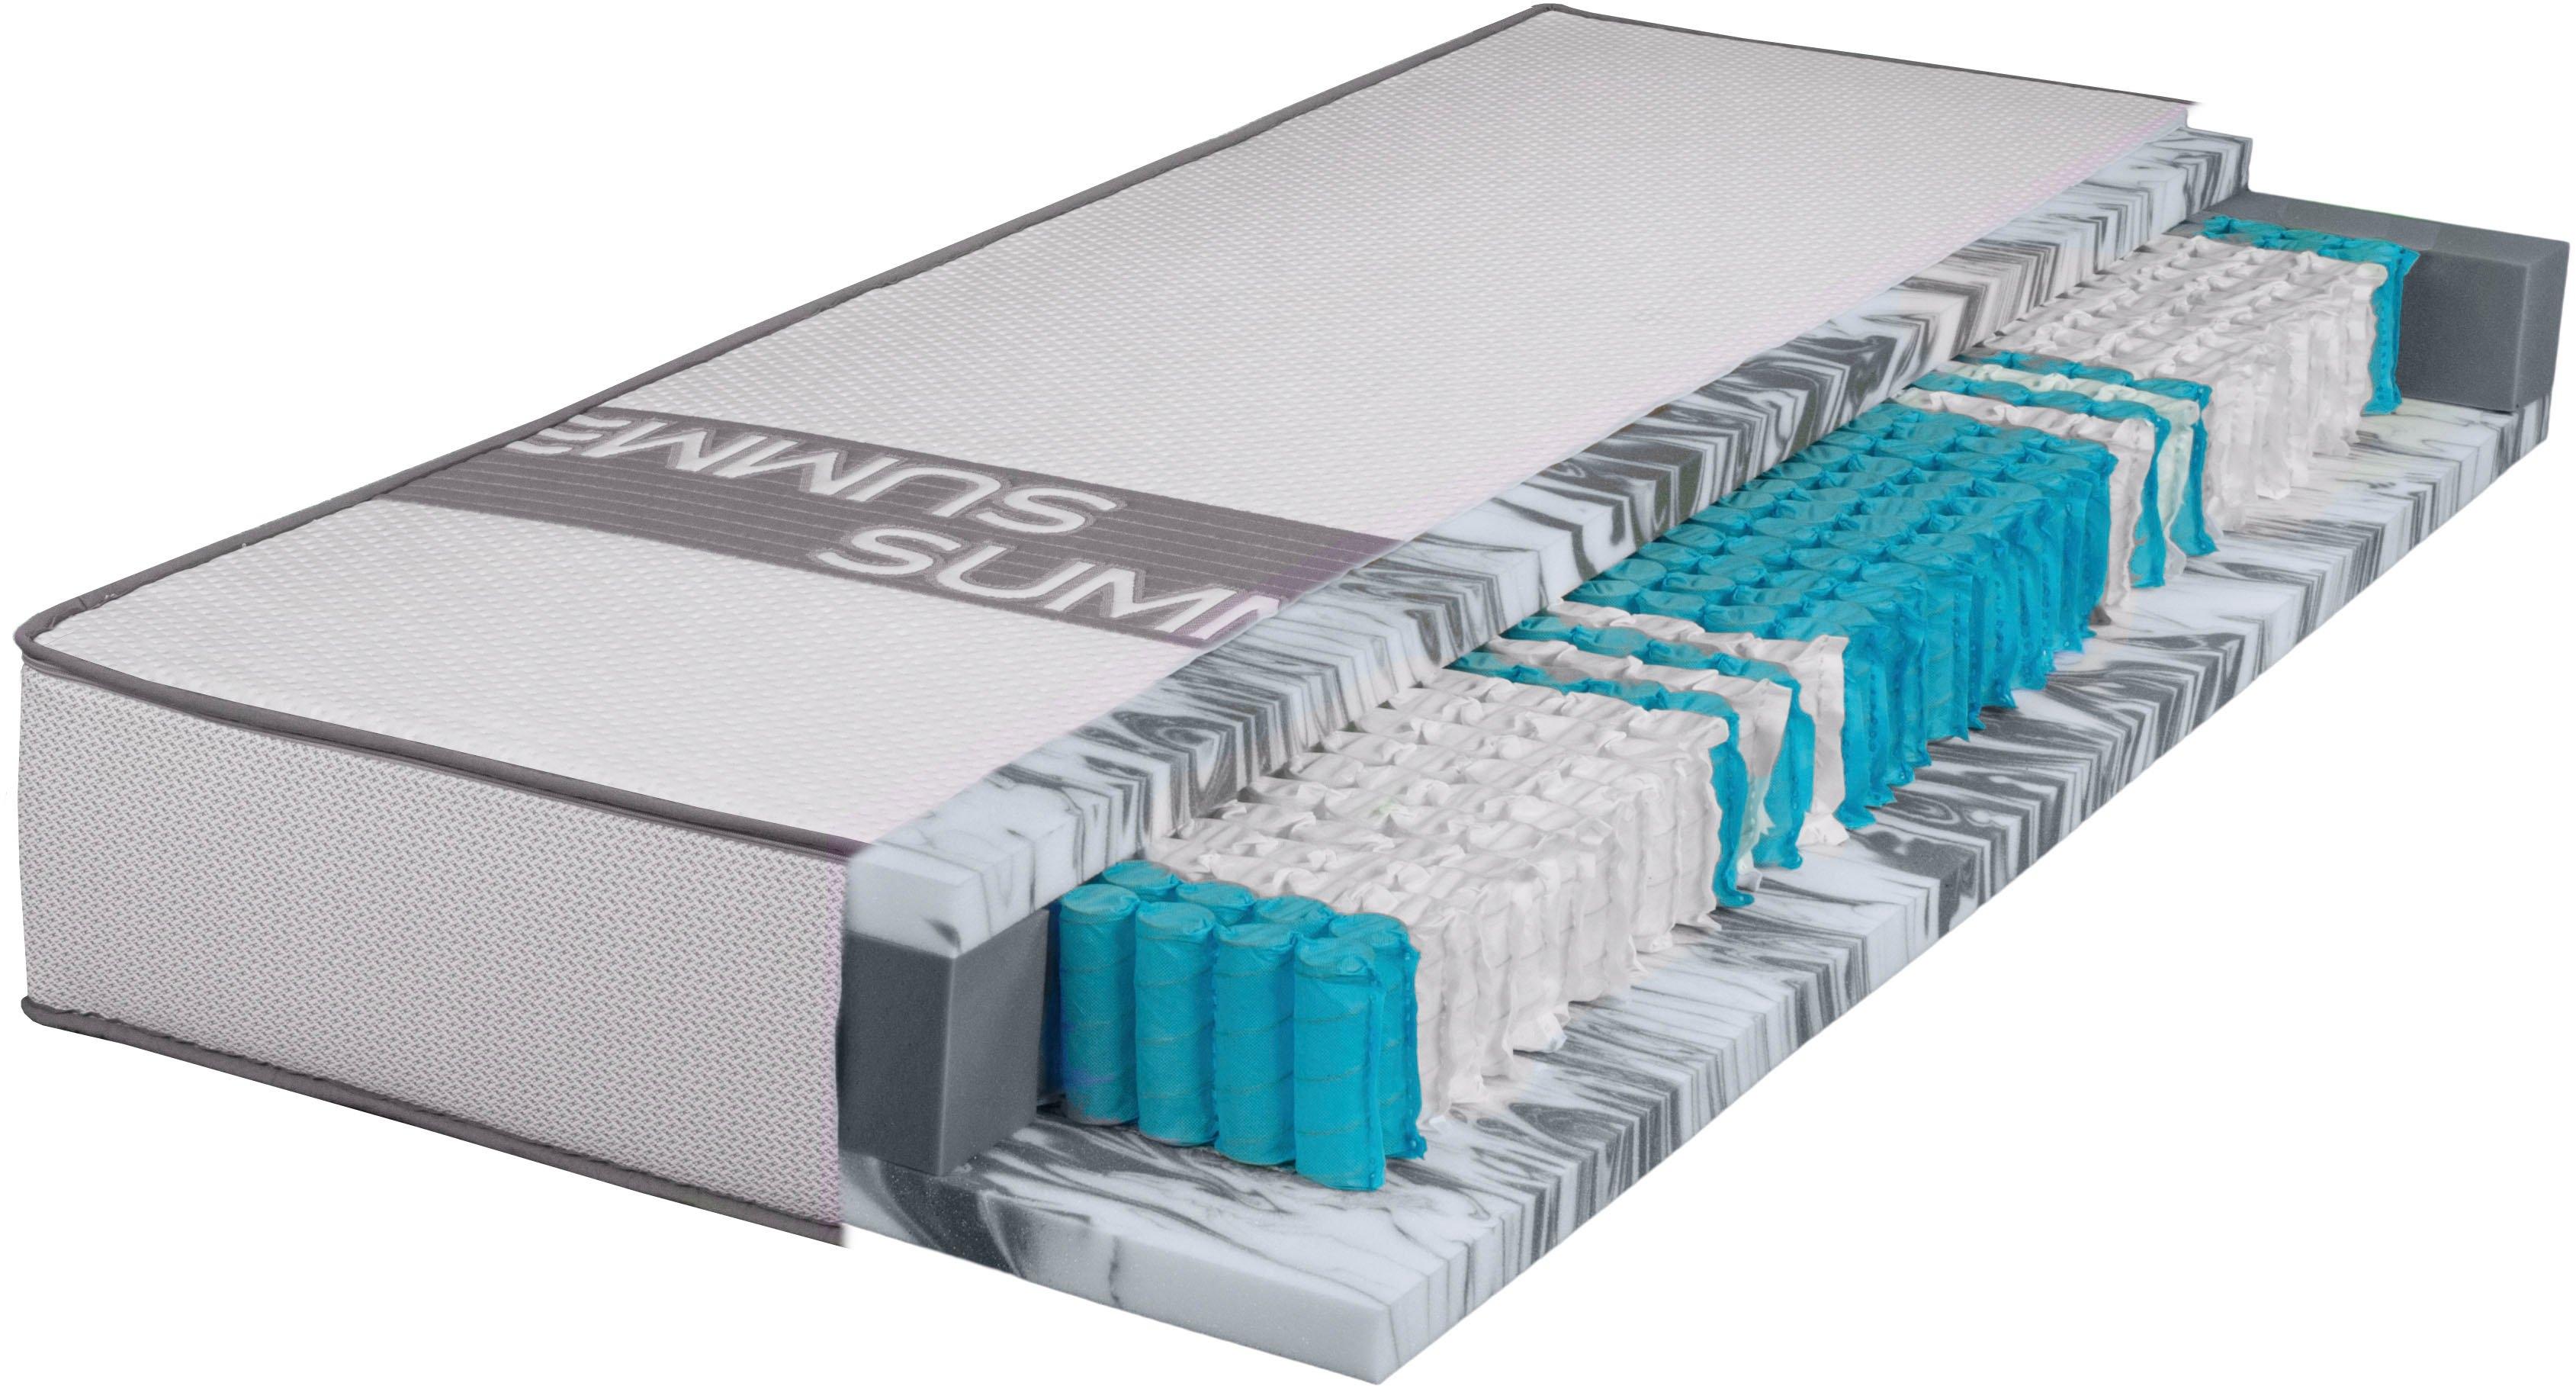 Breckle pocketveringsmatras SMARTSLEEP® 7000 hoogte 23 cm online kopen op otto.nl